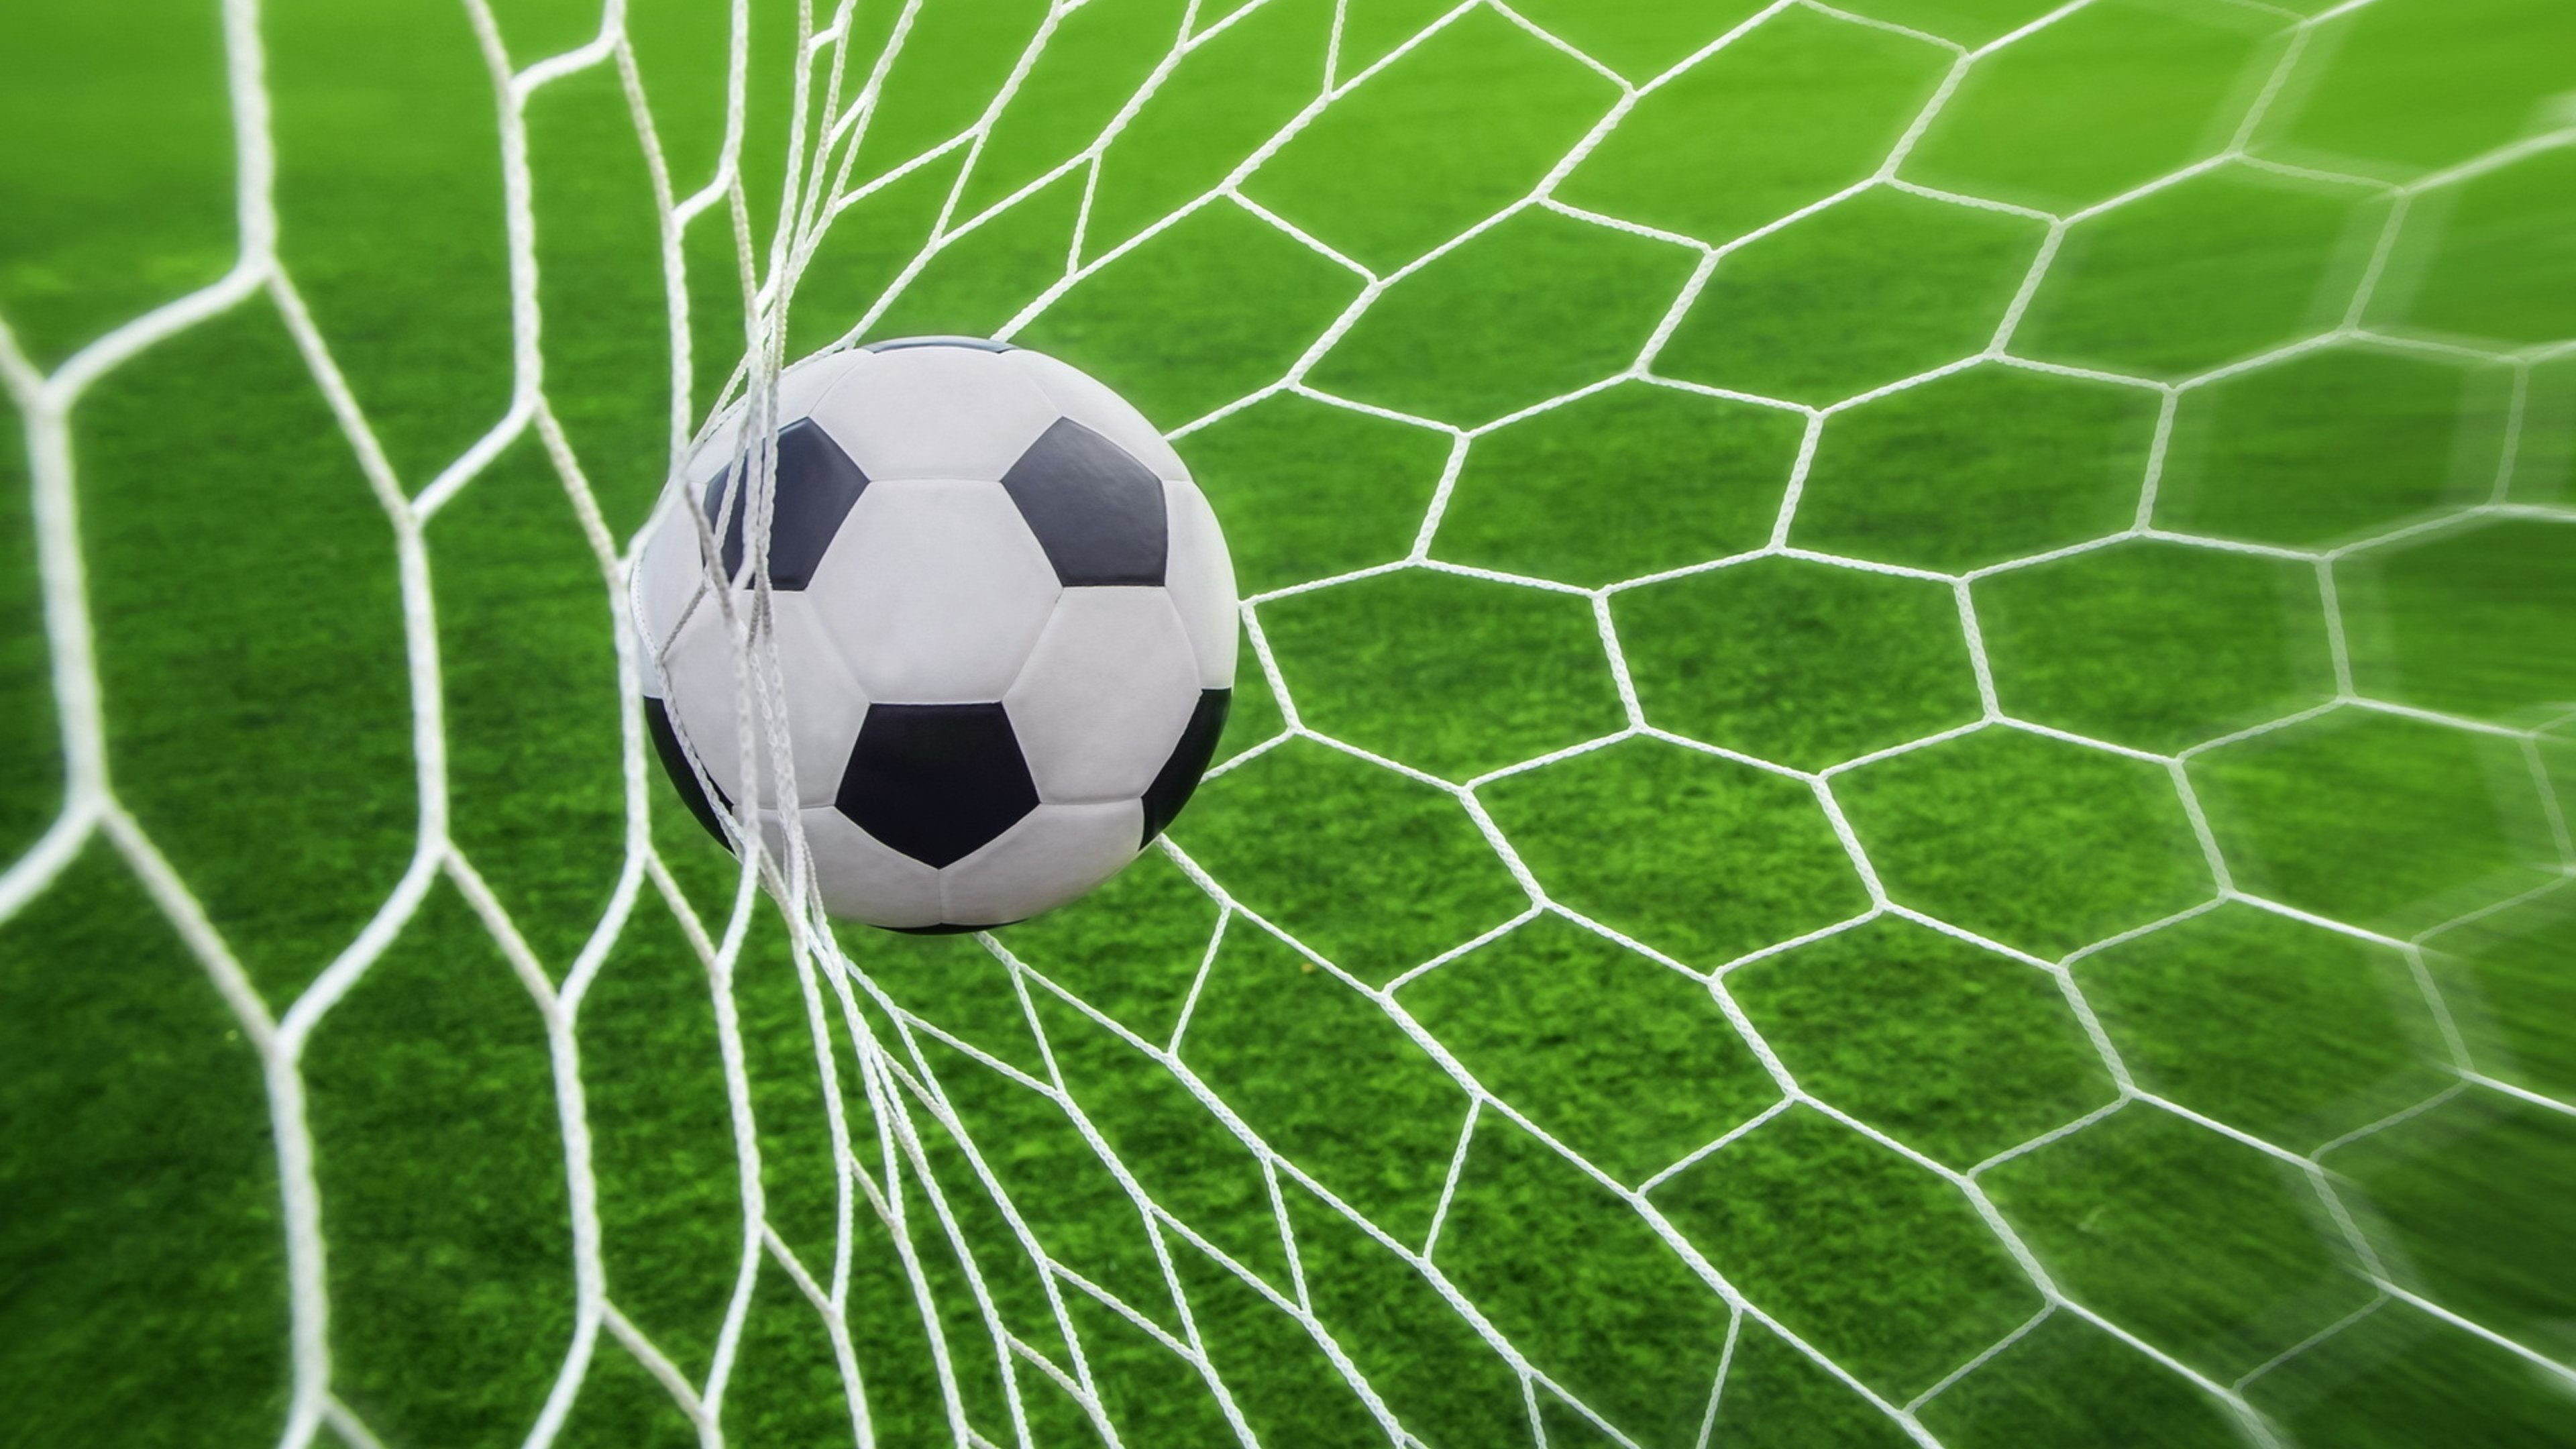 4k 16 9 Football Wallpapers Top Free 4k 16 9 Football Backgrounds Wallpaperaccess